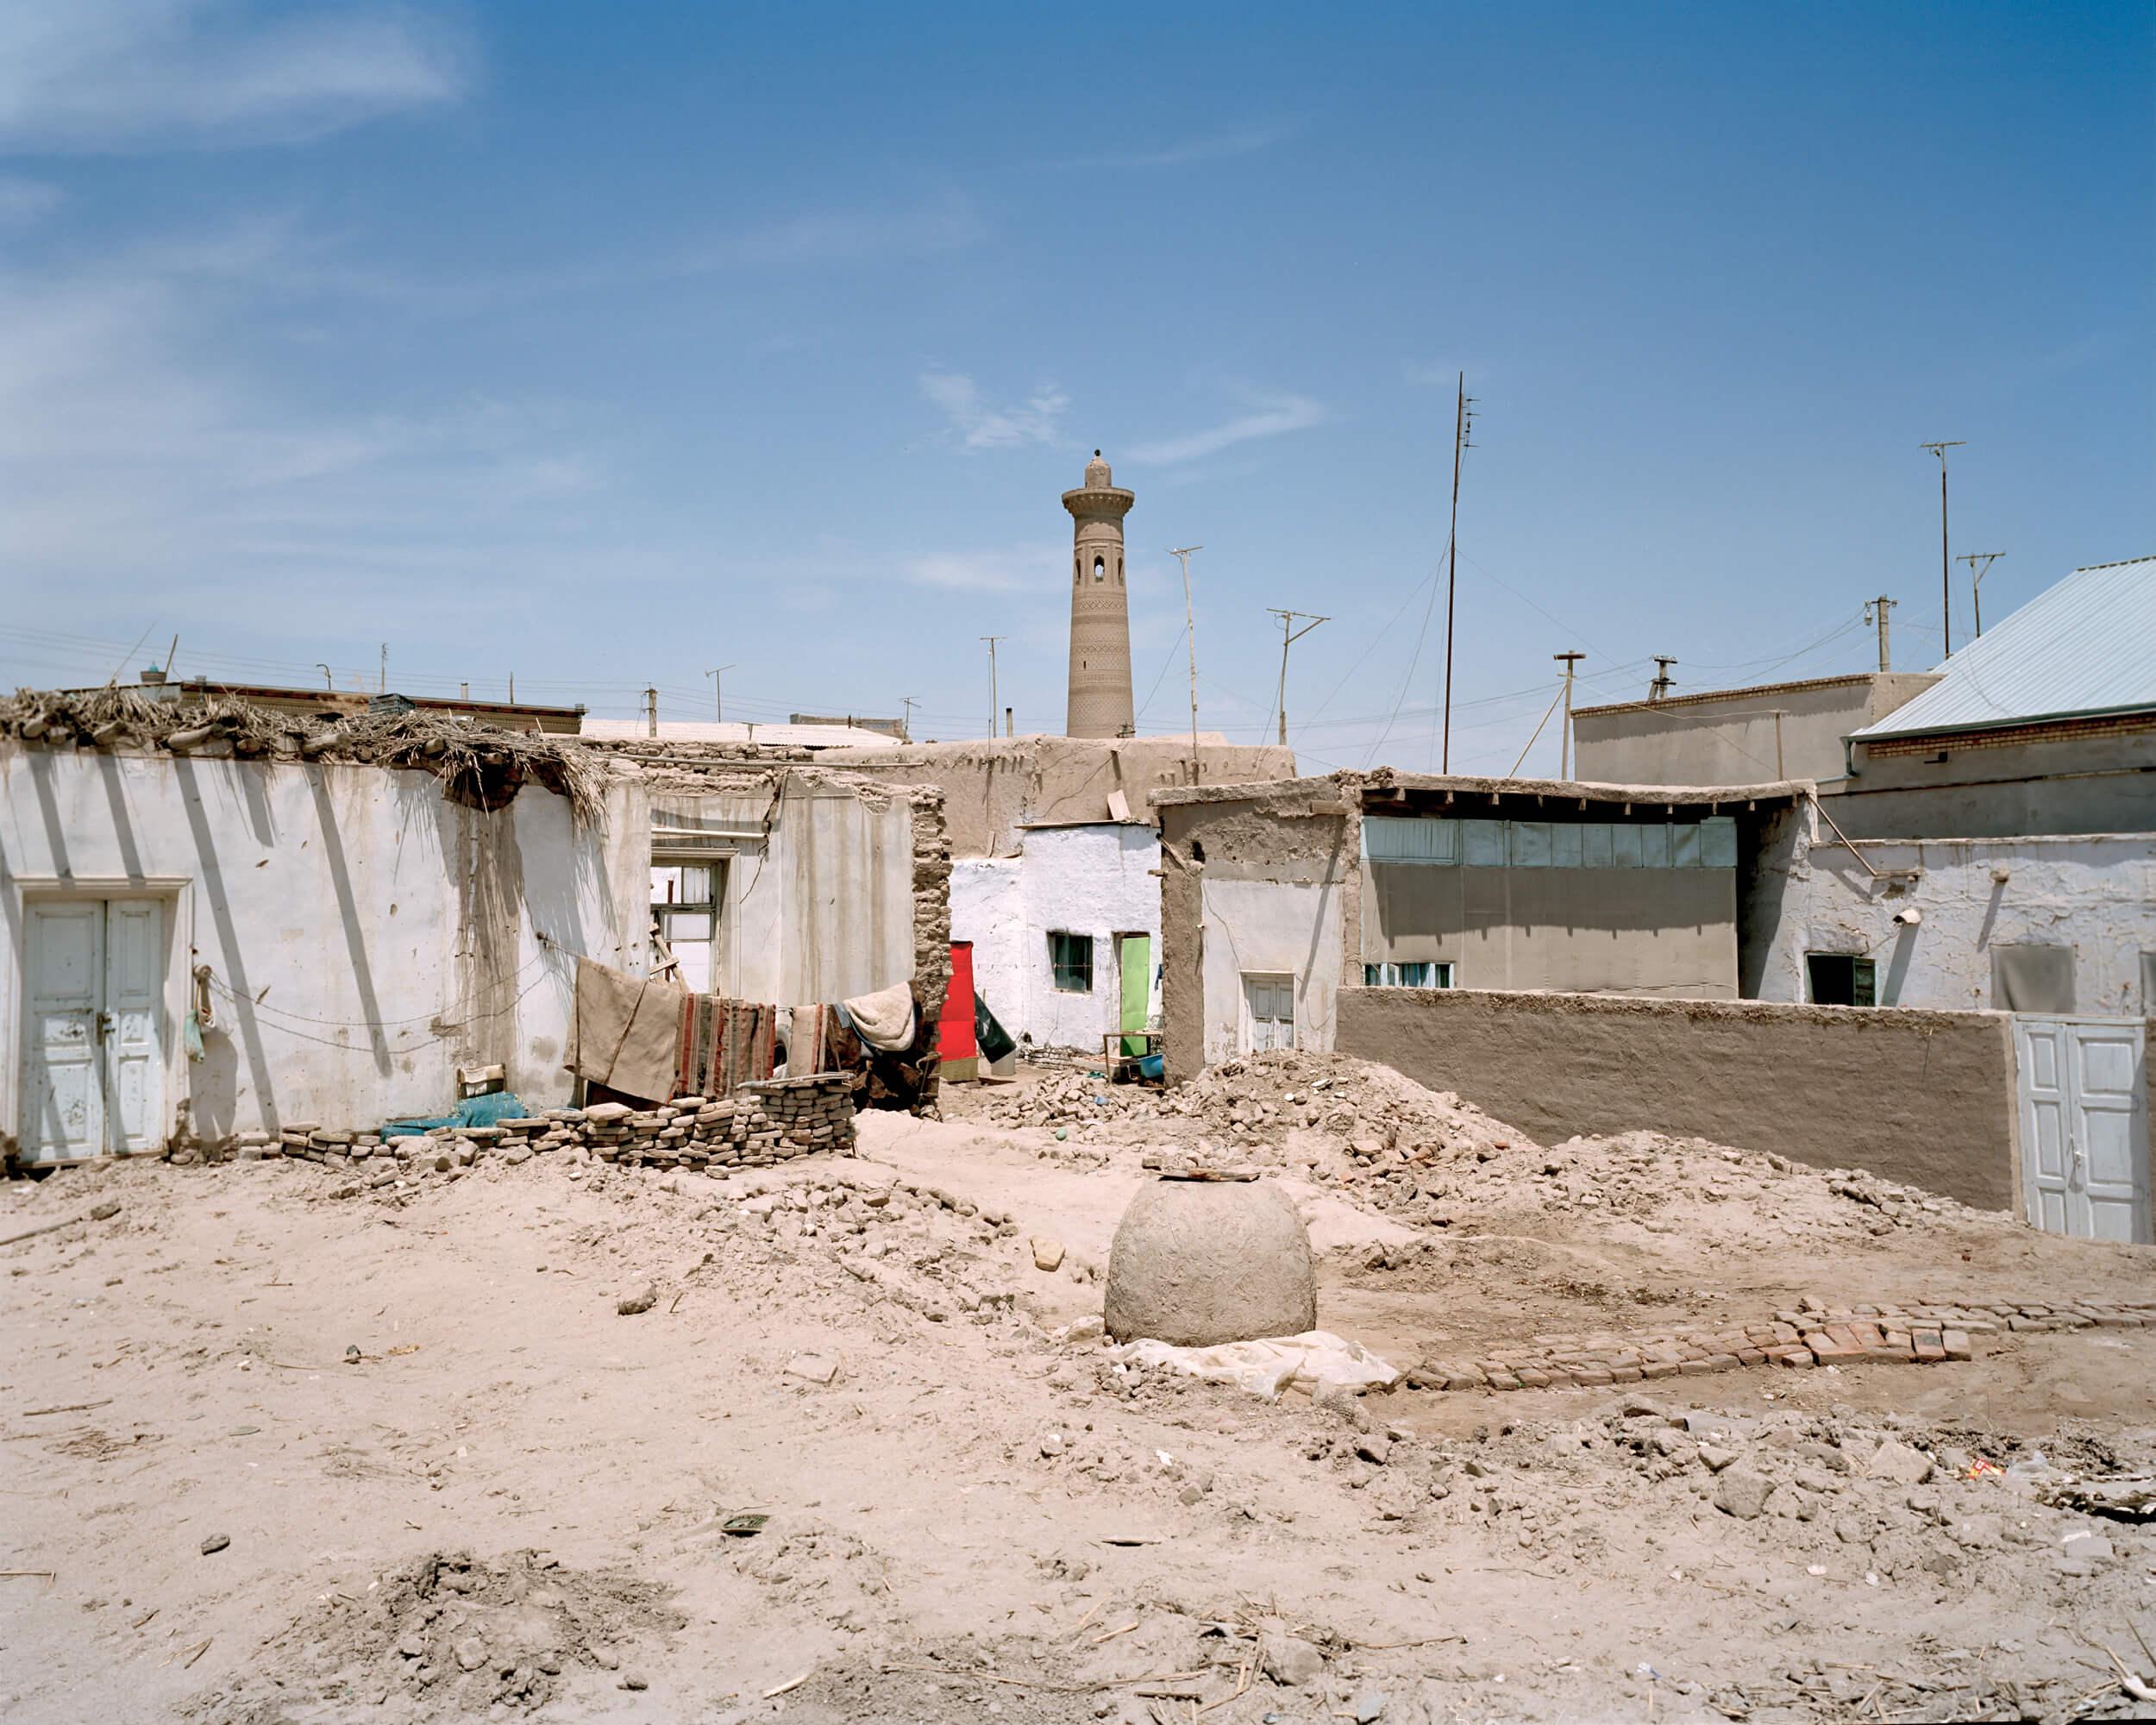 marco-barbieri-water-in-the-desert-32.jpg